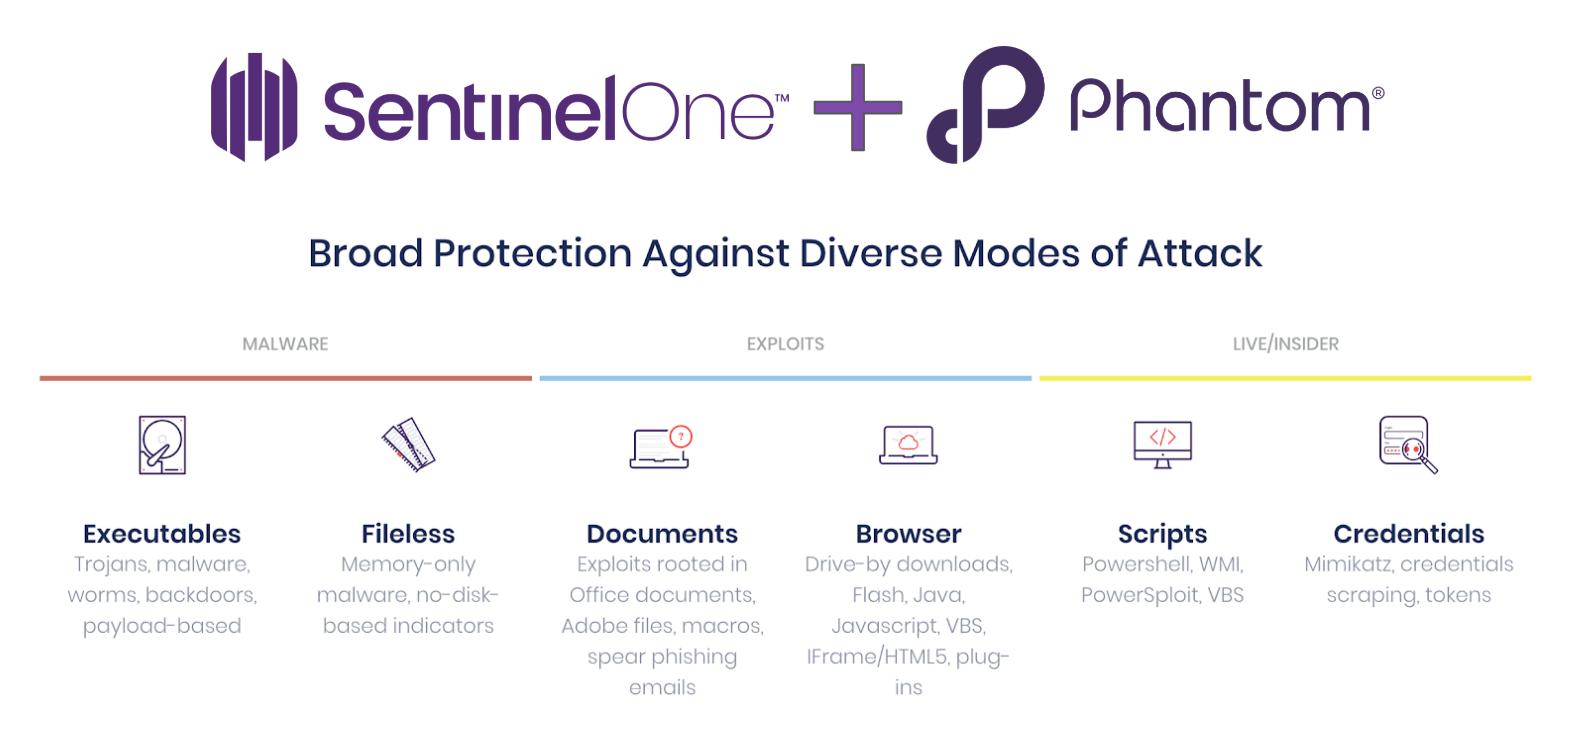 SentinelOne and Phantom Integration